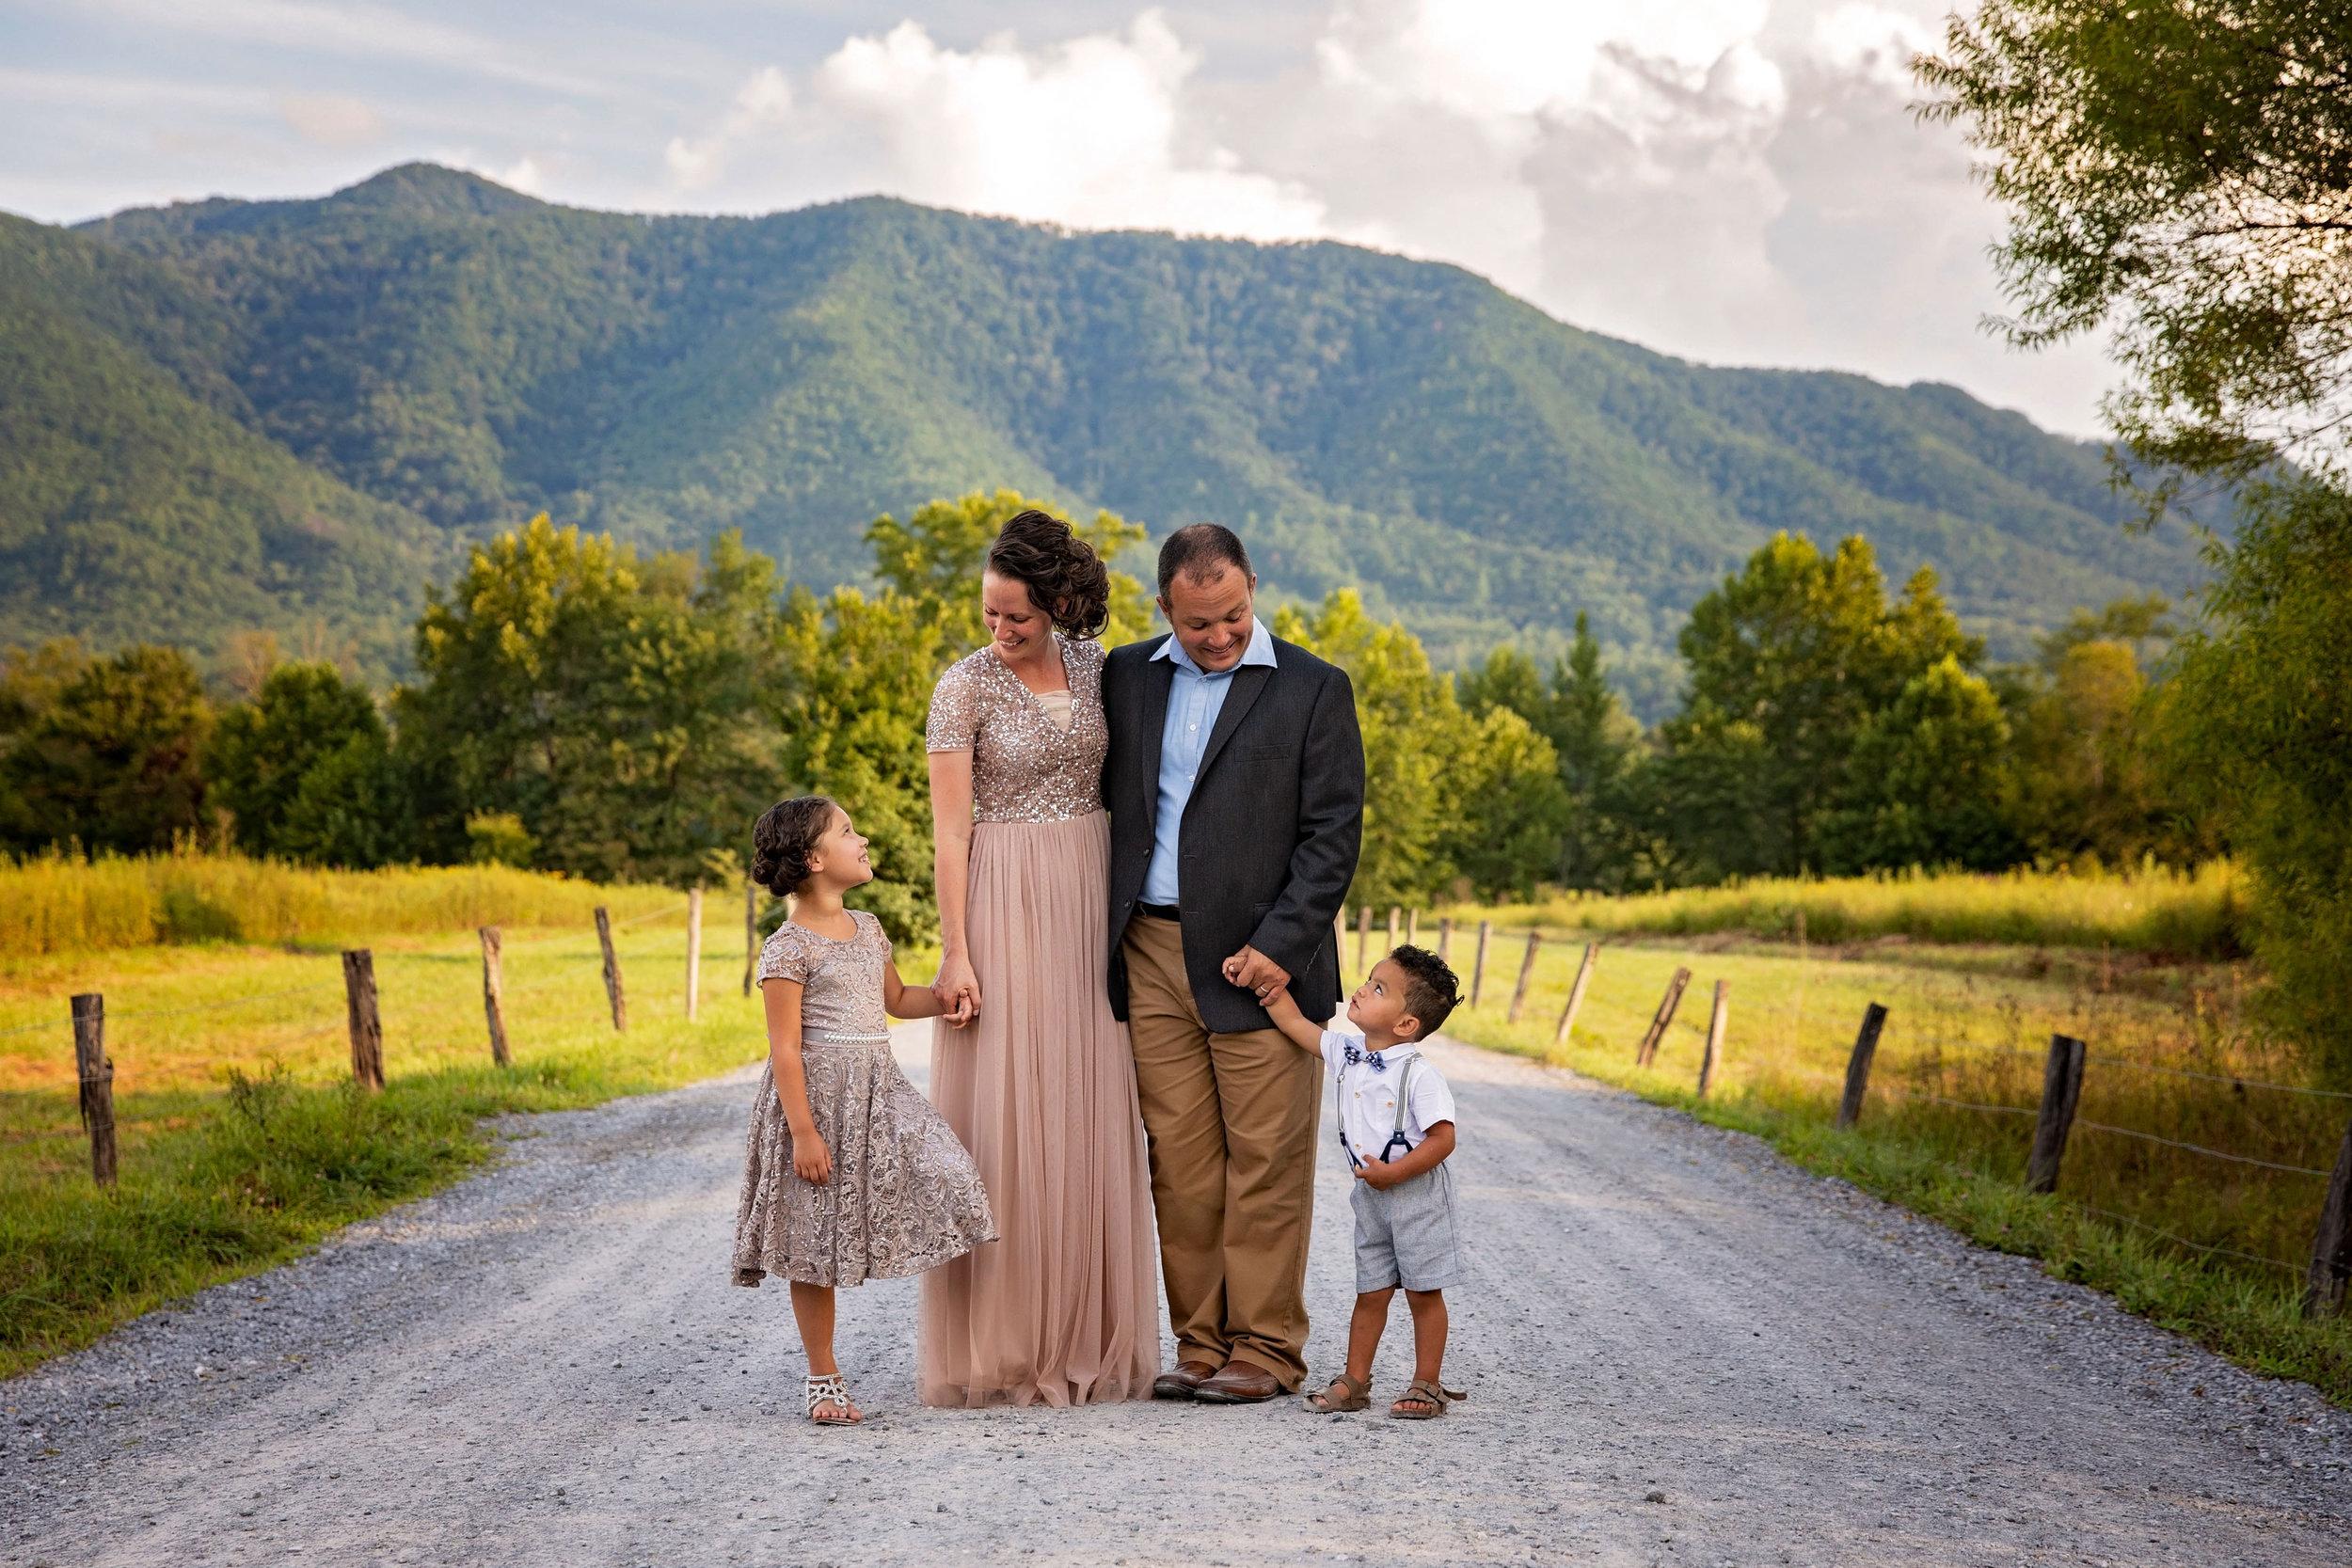 gatlinburg-photographer-country-road-family-session.jpg